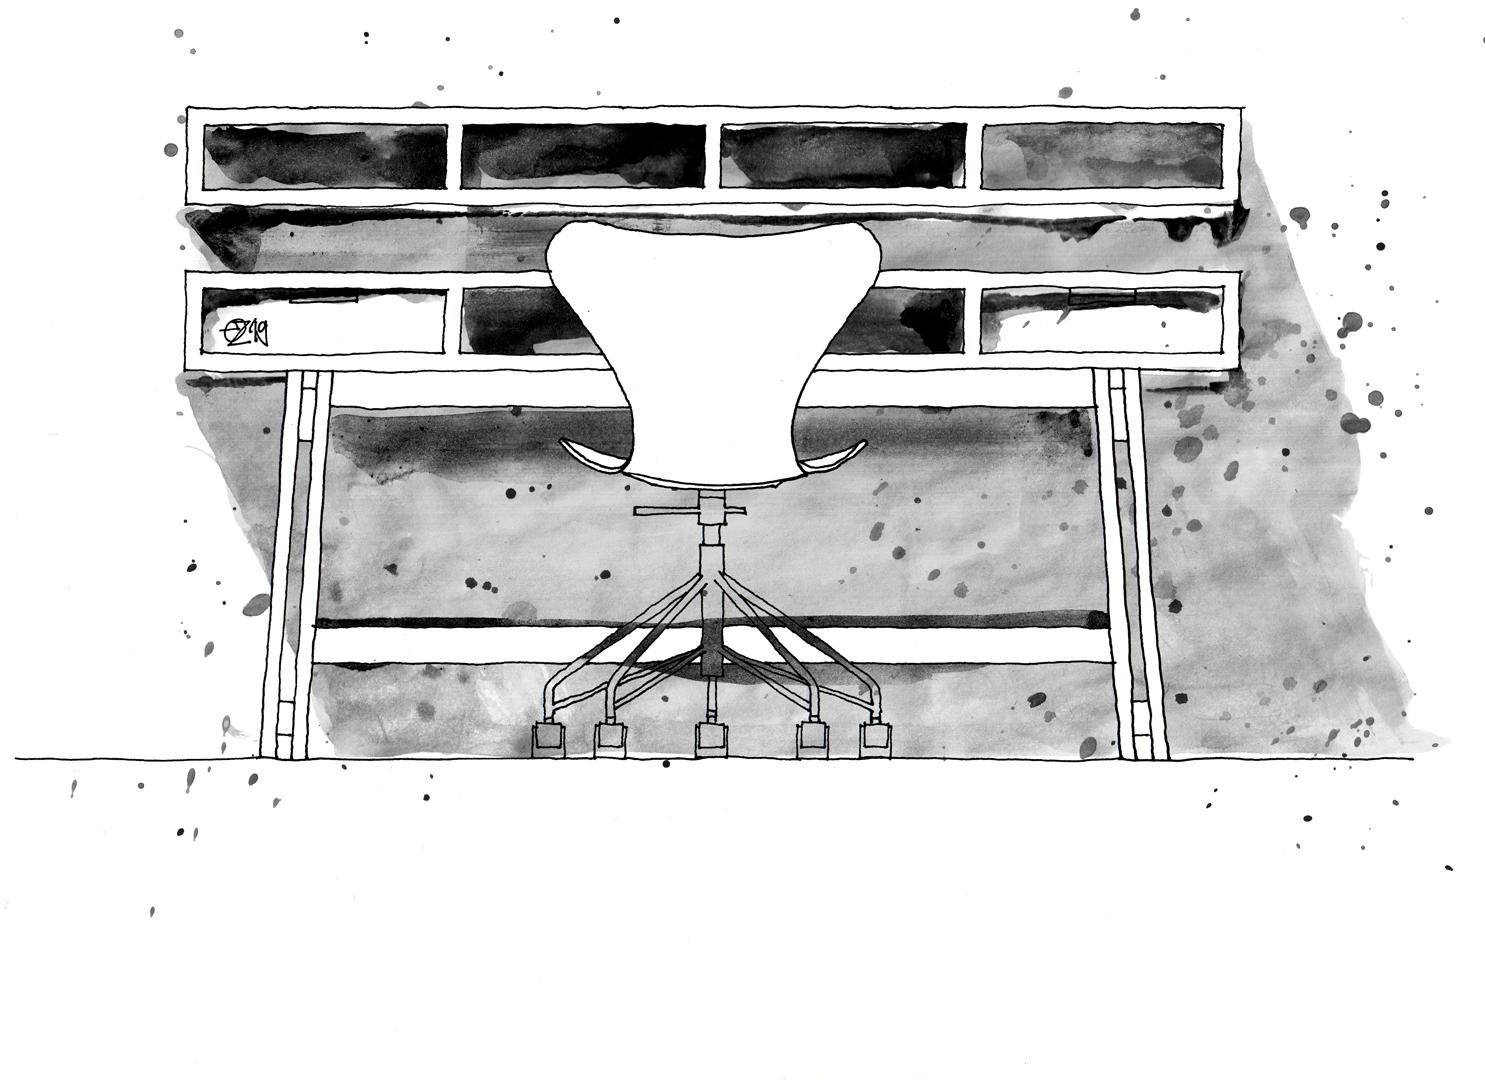 Homeoffice Berlin Schreibtisch mit Schubkästen und Wandregal. Work Desk with drawers on wooden frame and wall mounted shelf made from wooden boards. Design and furniture design illustration by Studio KERTI